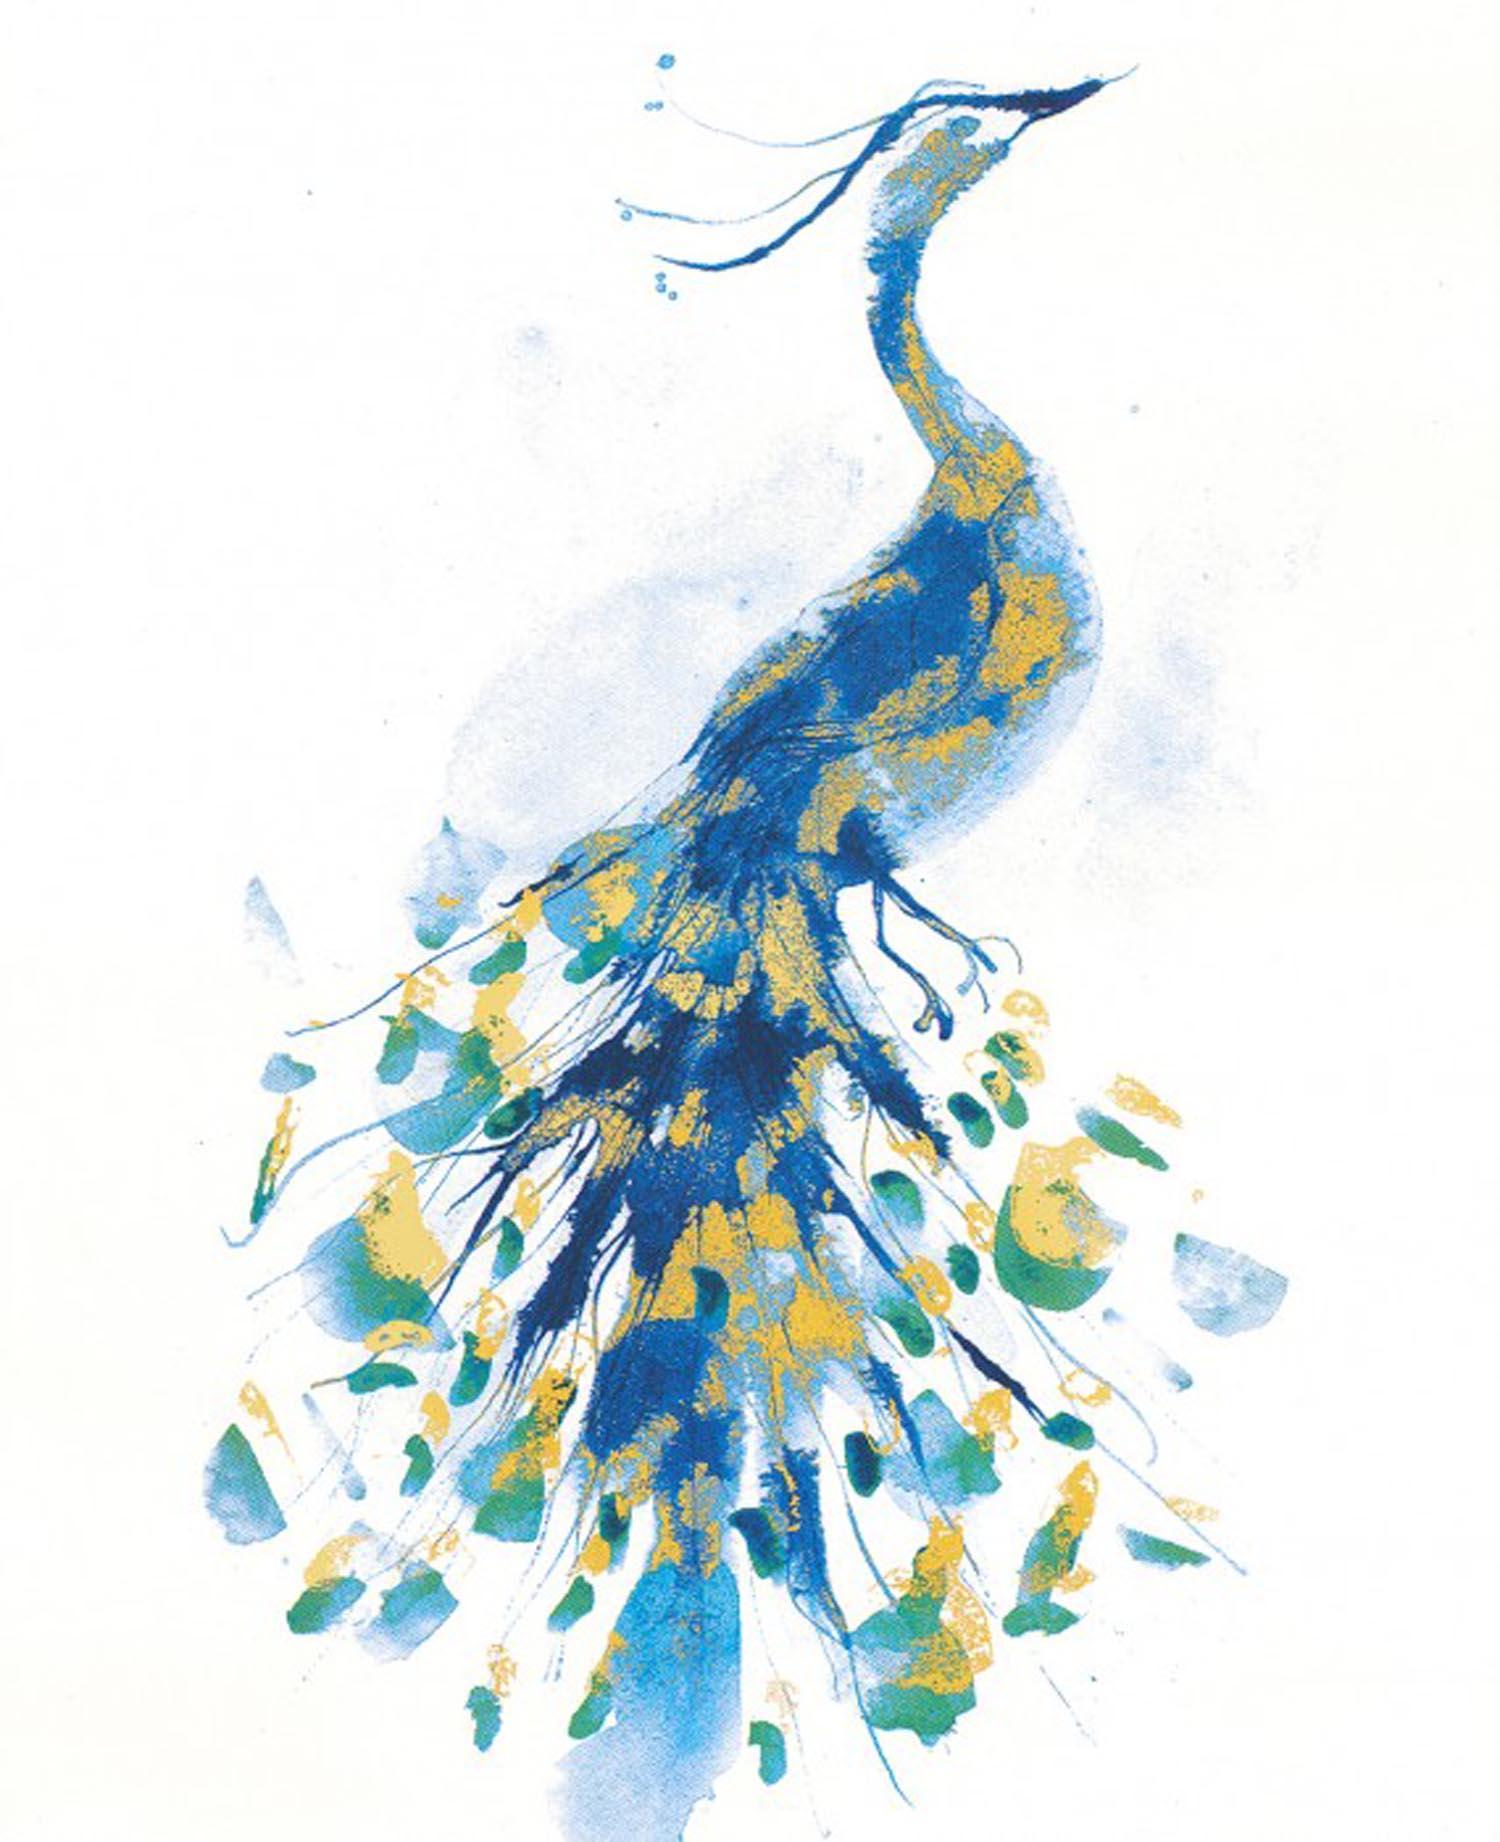 Peacock Gold, Limited Edition Print, Gavin Dobson, Animal Art